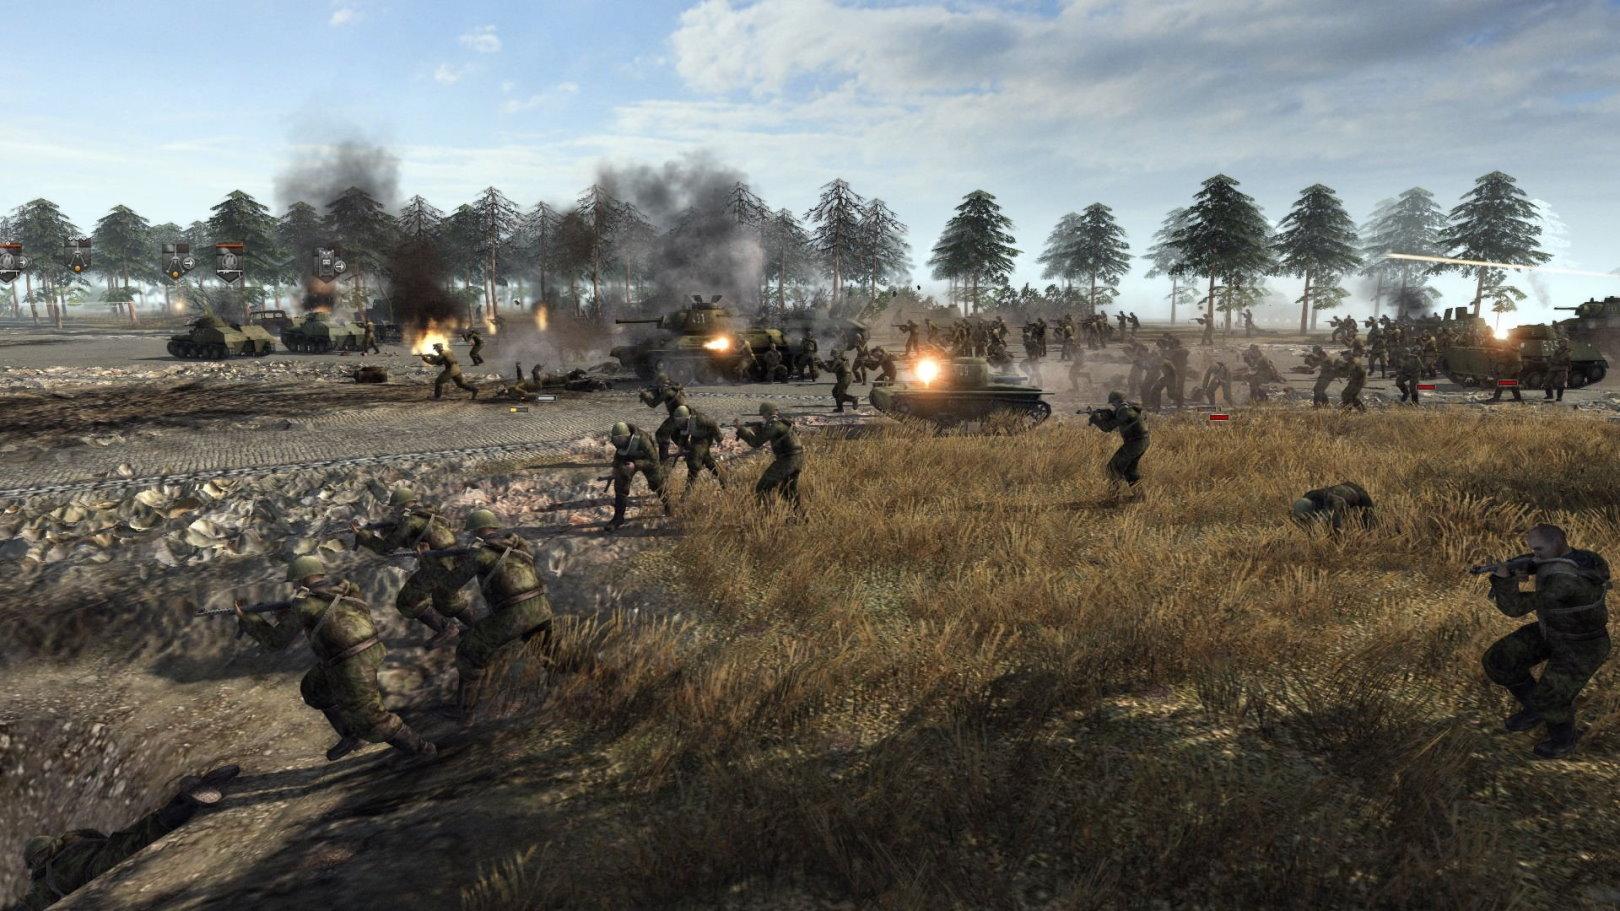 Скачать Battle of Deutschland v1.01 (AS2 — 3.262.0) (v05.10.2021)